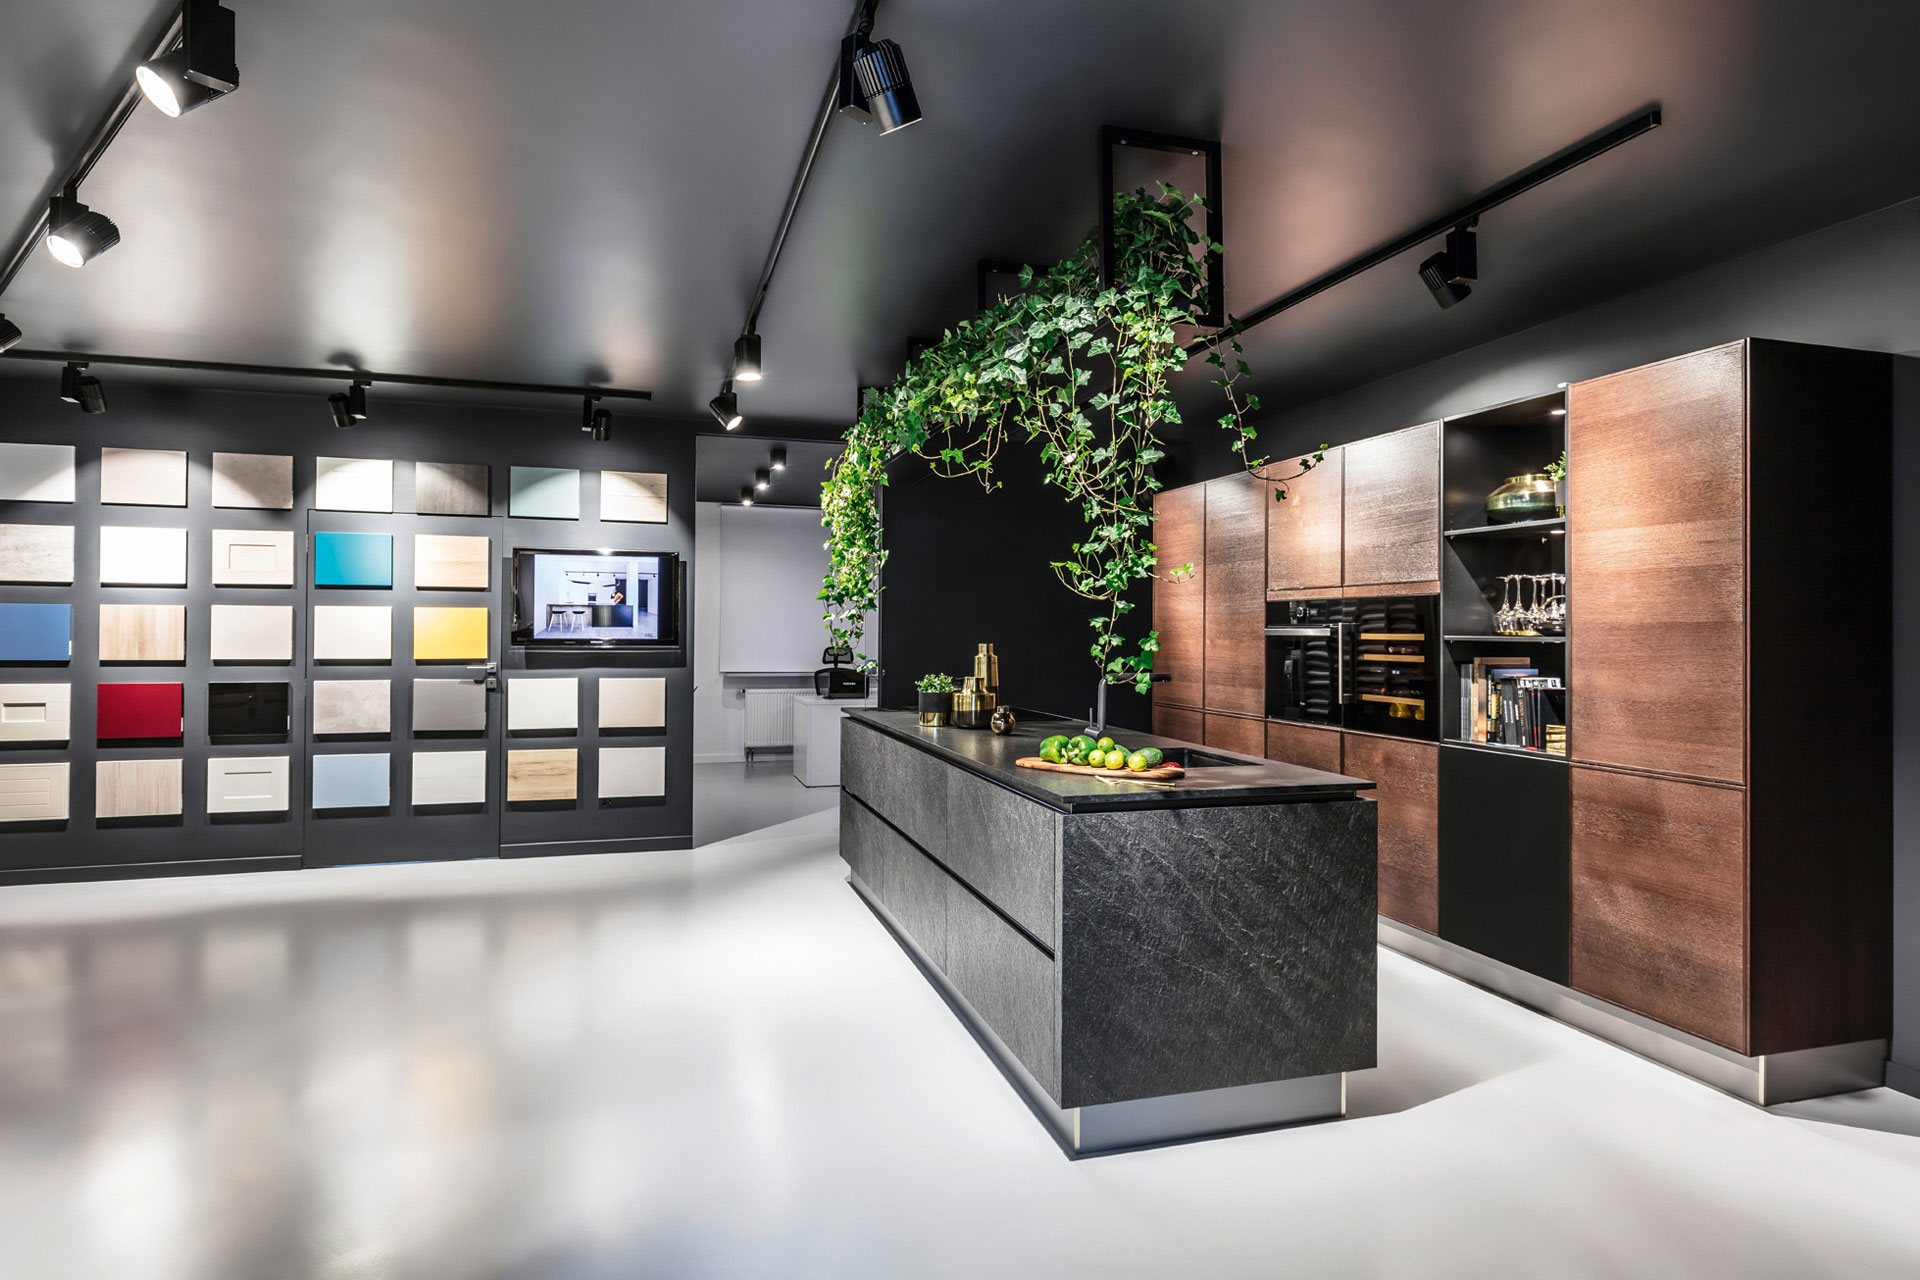 Studio Kuchenne - SAS Wnętrza i Kuchnie - meble kuchenne na wymiar